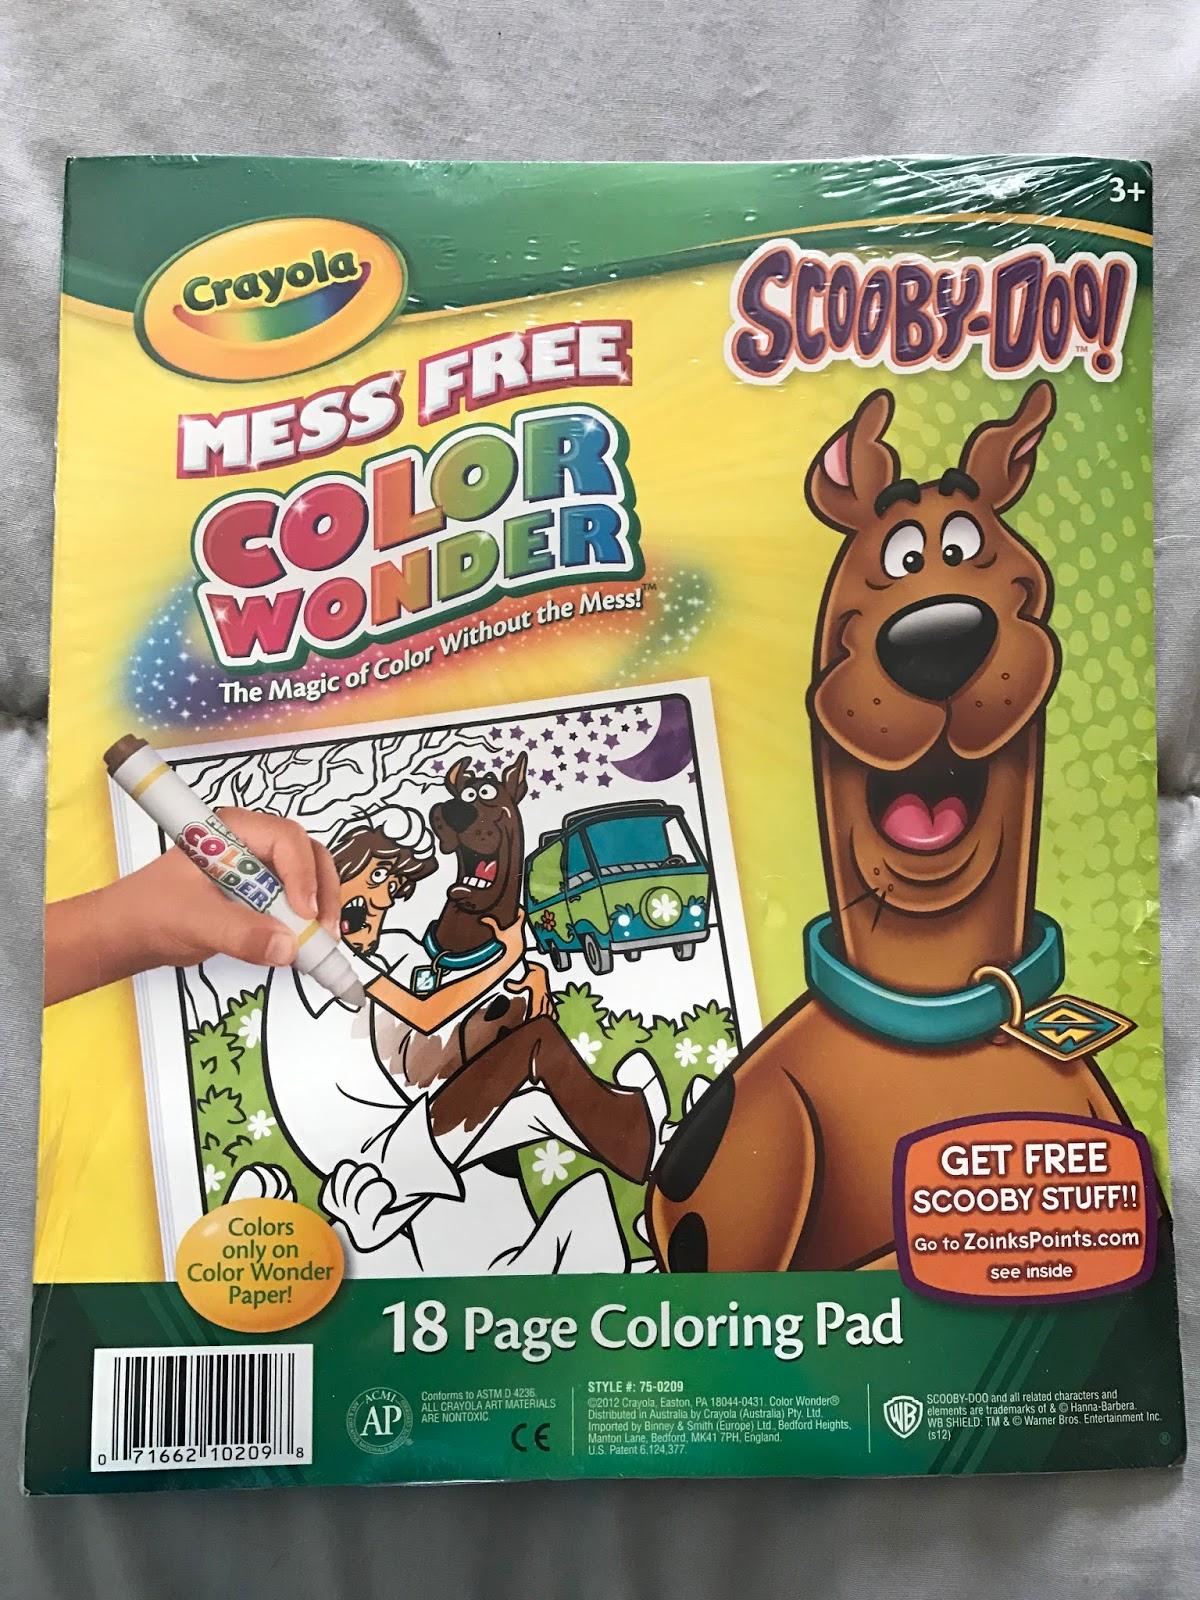 ScoobyAddict's Blog: My Scooby Stuff - Day 114 - Scooby